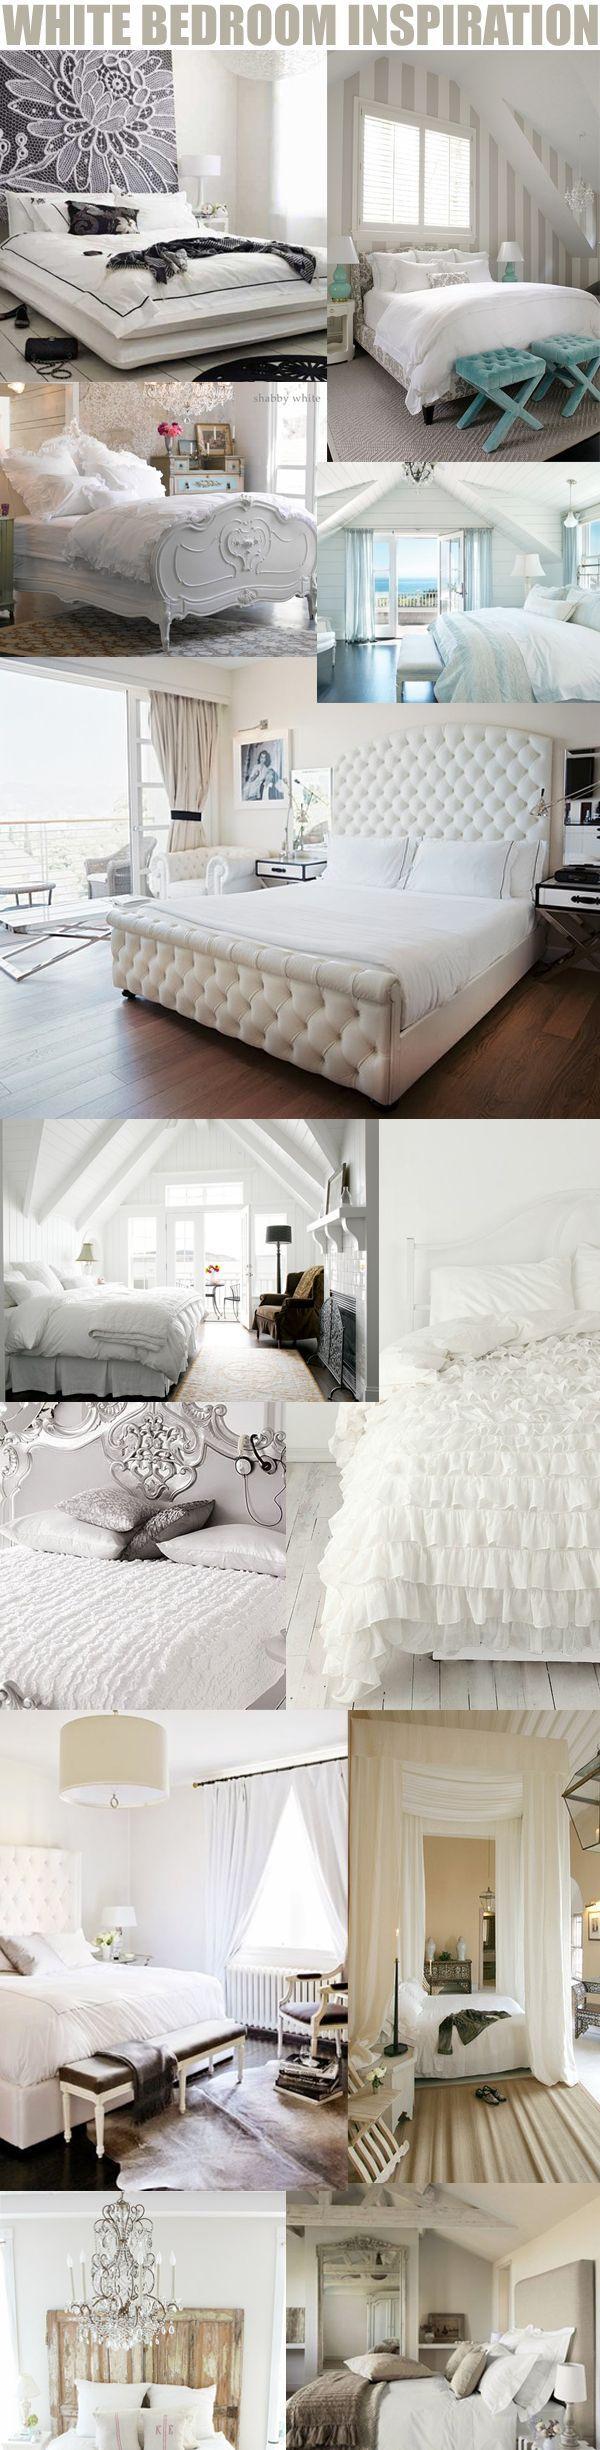 Bedroom Decorating Idea, White Bedroom Decor